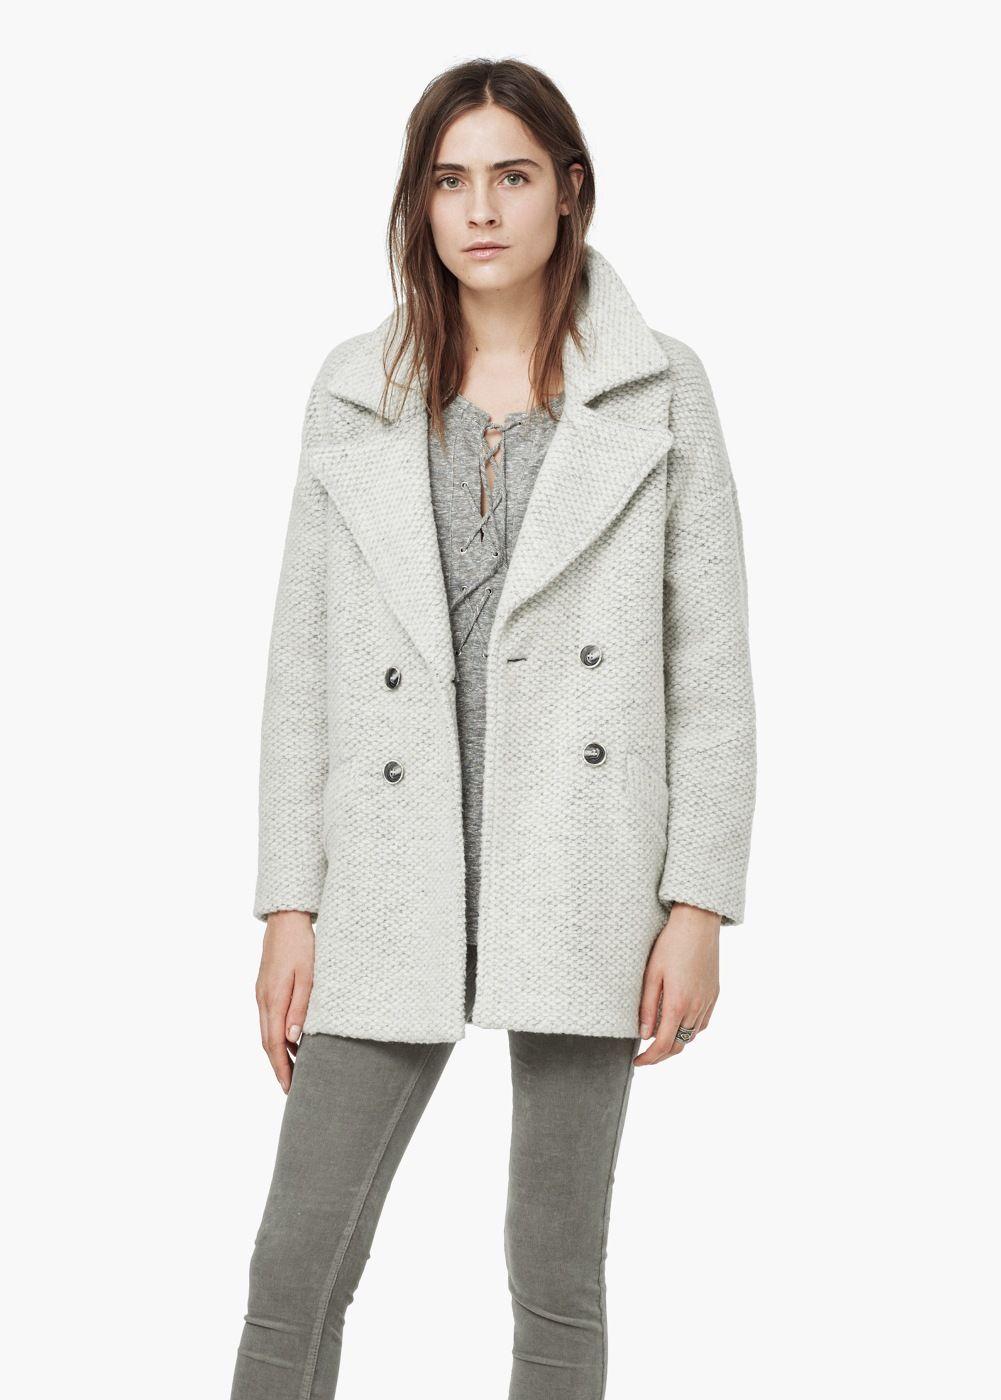 Abrigo bouclé lana Mujer | Coat, Wool coat, Coats for women